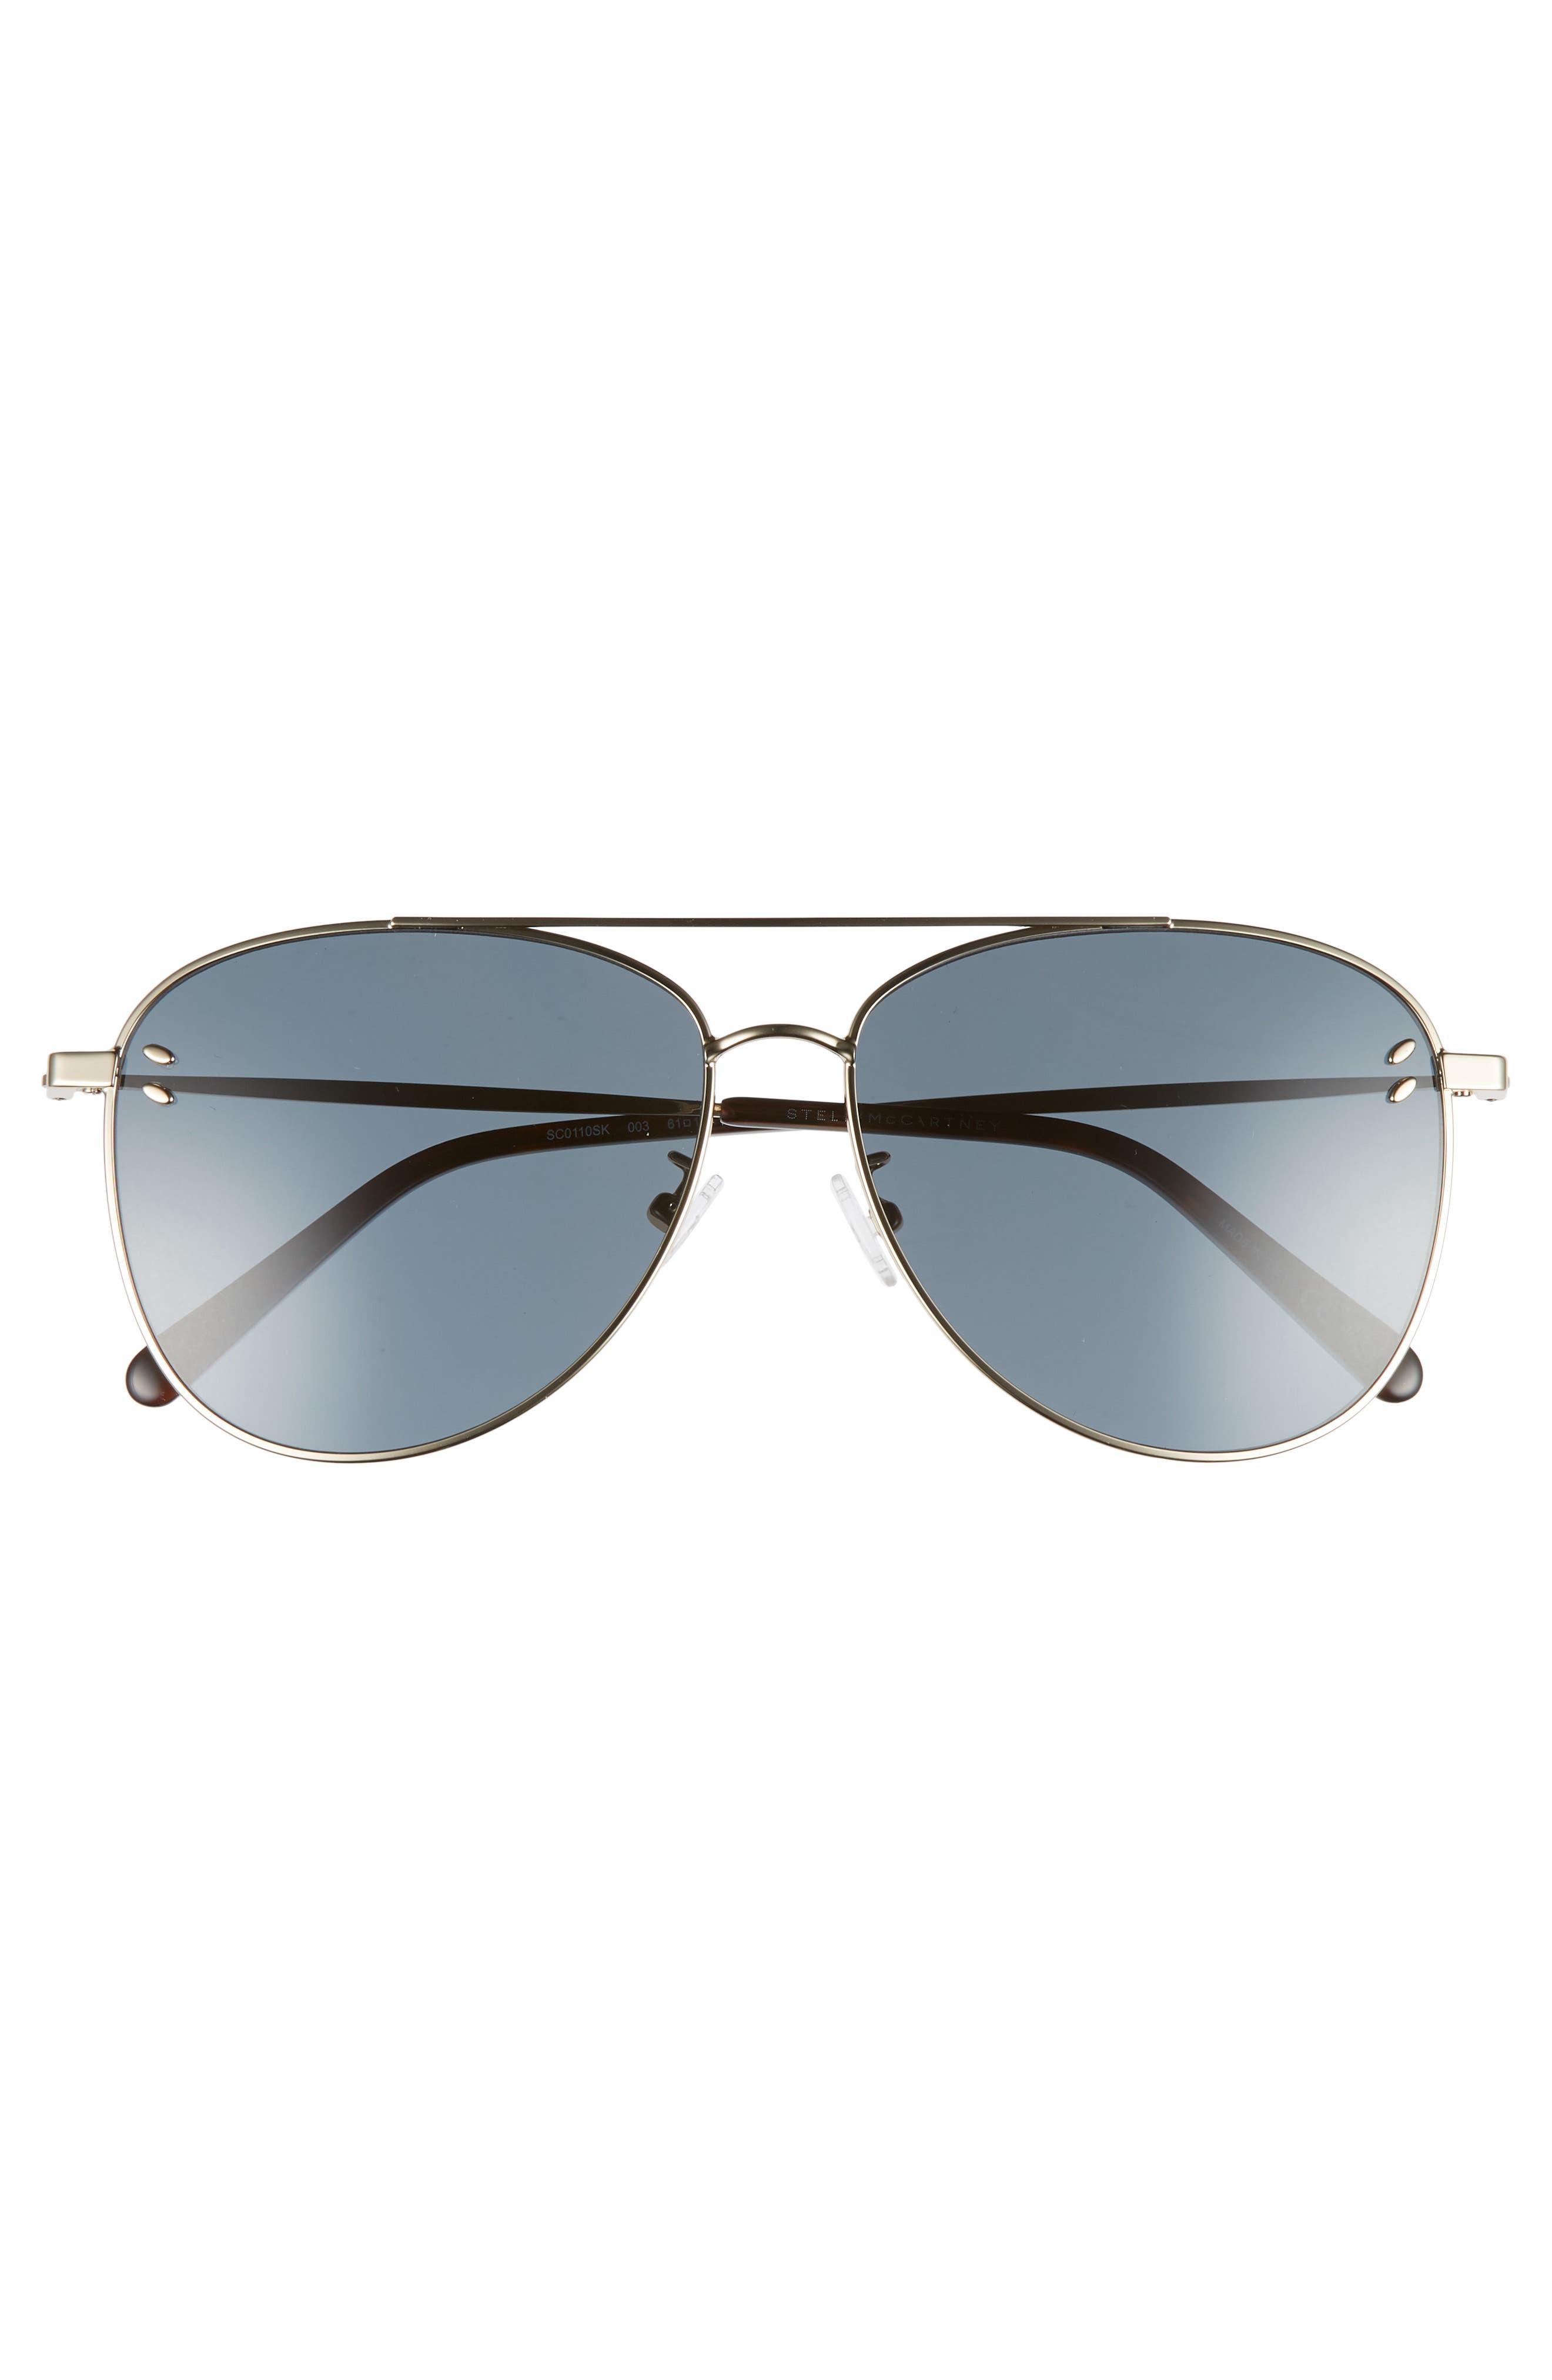 61mm Aviator Sunglasses,                             Alternate thumbnail 3, color,                             Gold